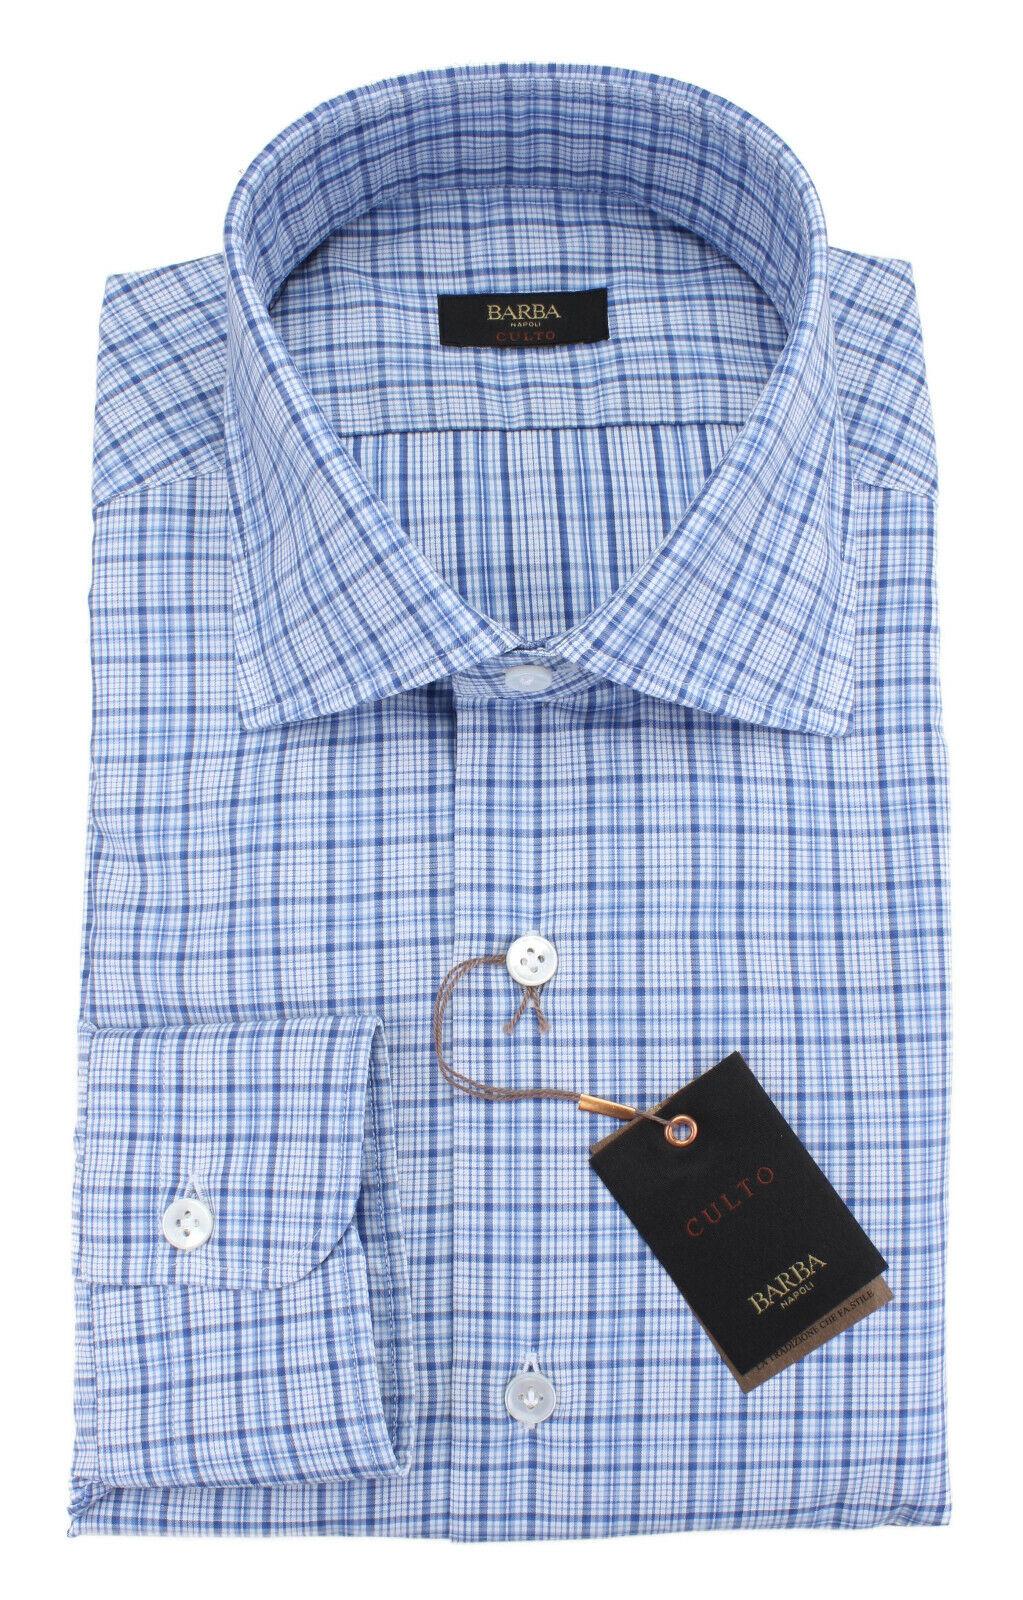 NWT BARBA NAPOLI hemd Culto Weiß Blau check handmade  43 17